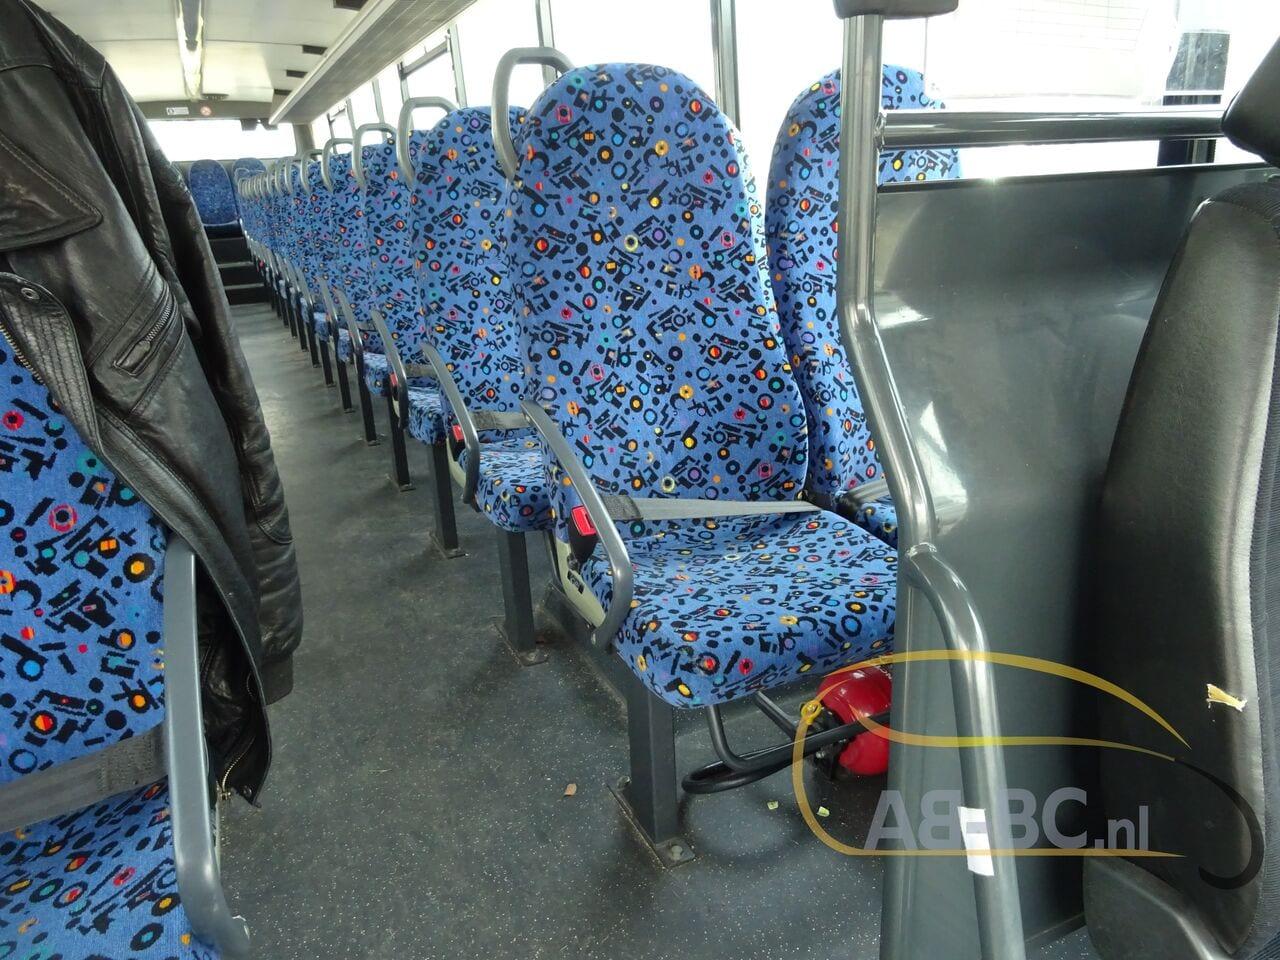 interurban-busMAN-Fast-64-seats---1619619952133261371_big_eee84f94758c78e227a788ff1aff5fc6--21042817163019598600